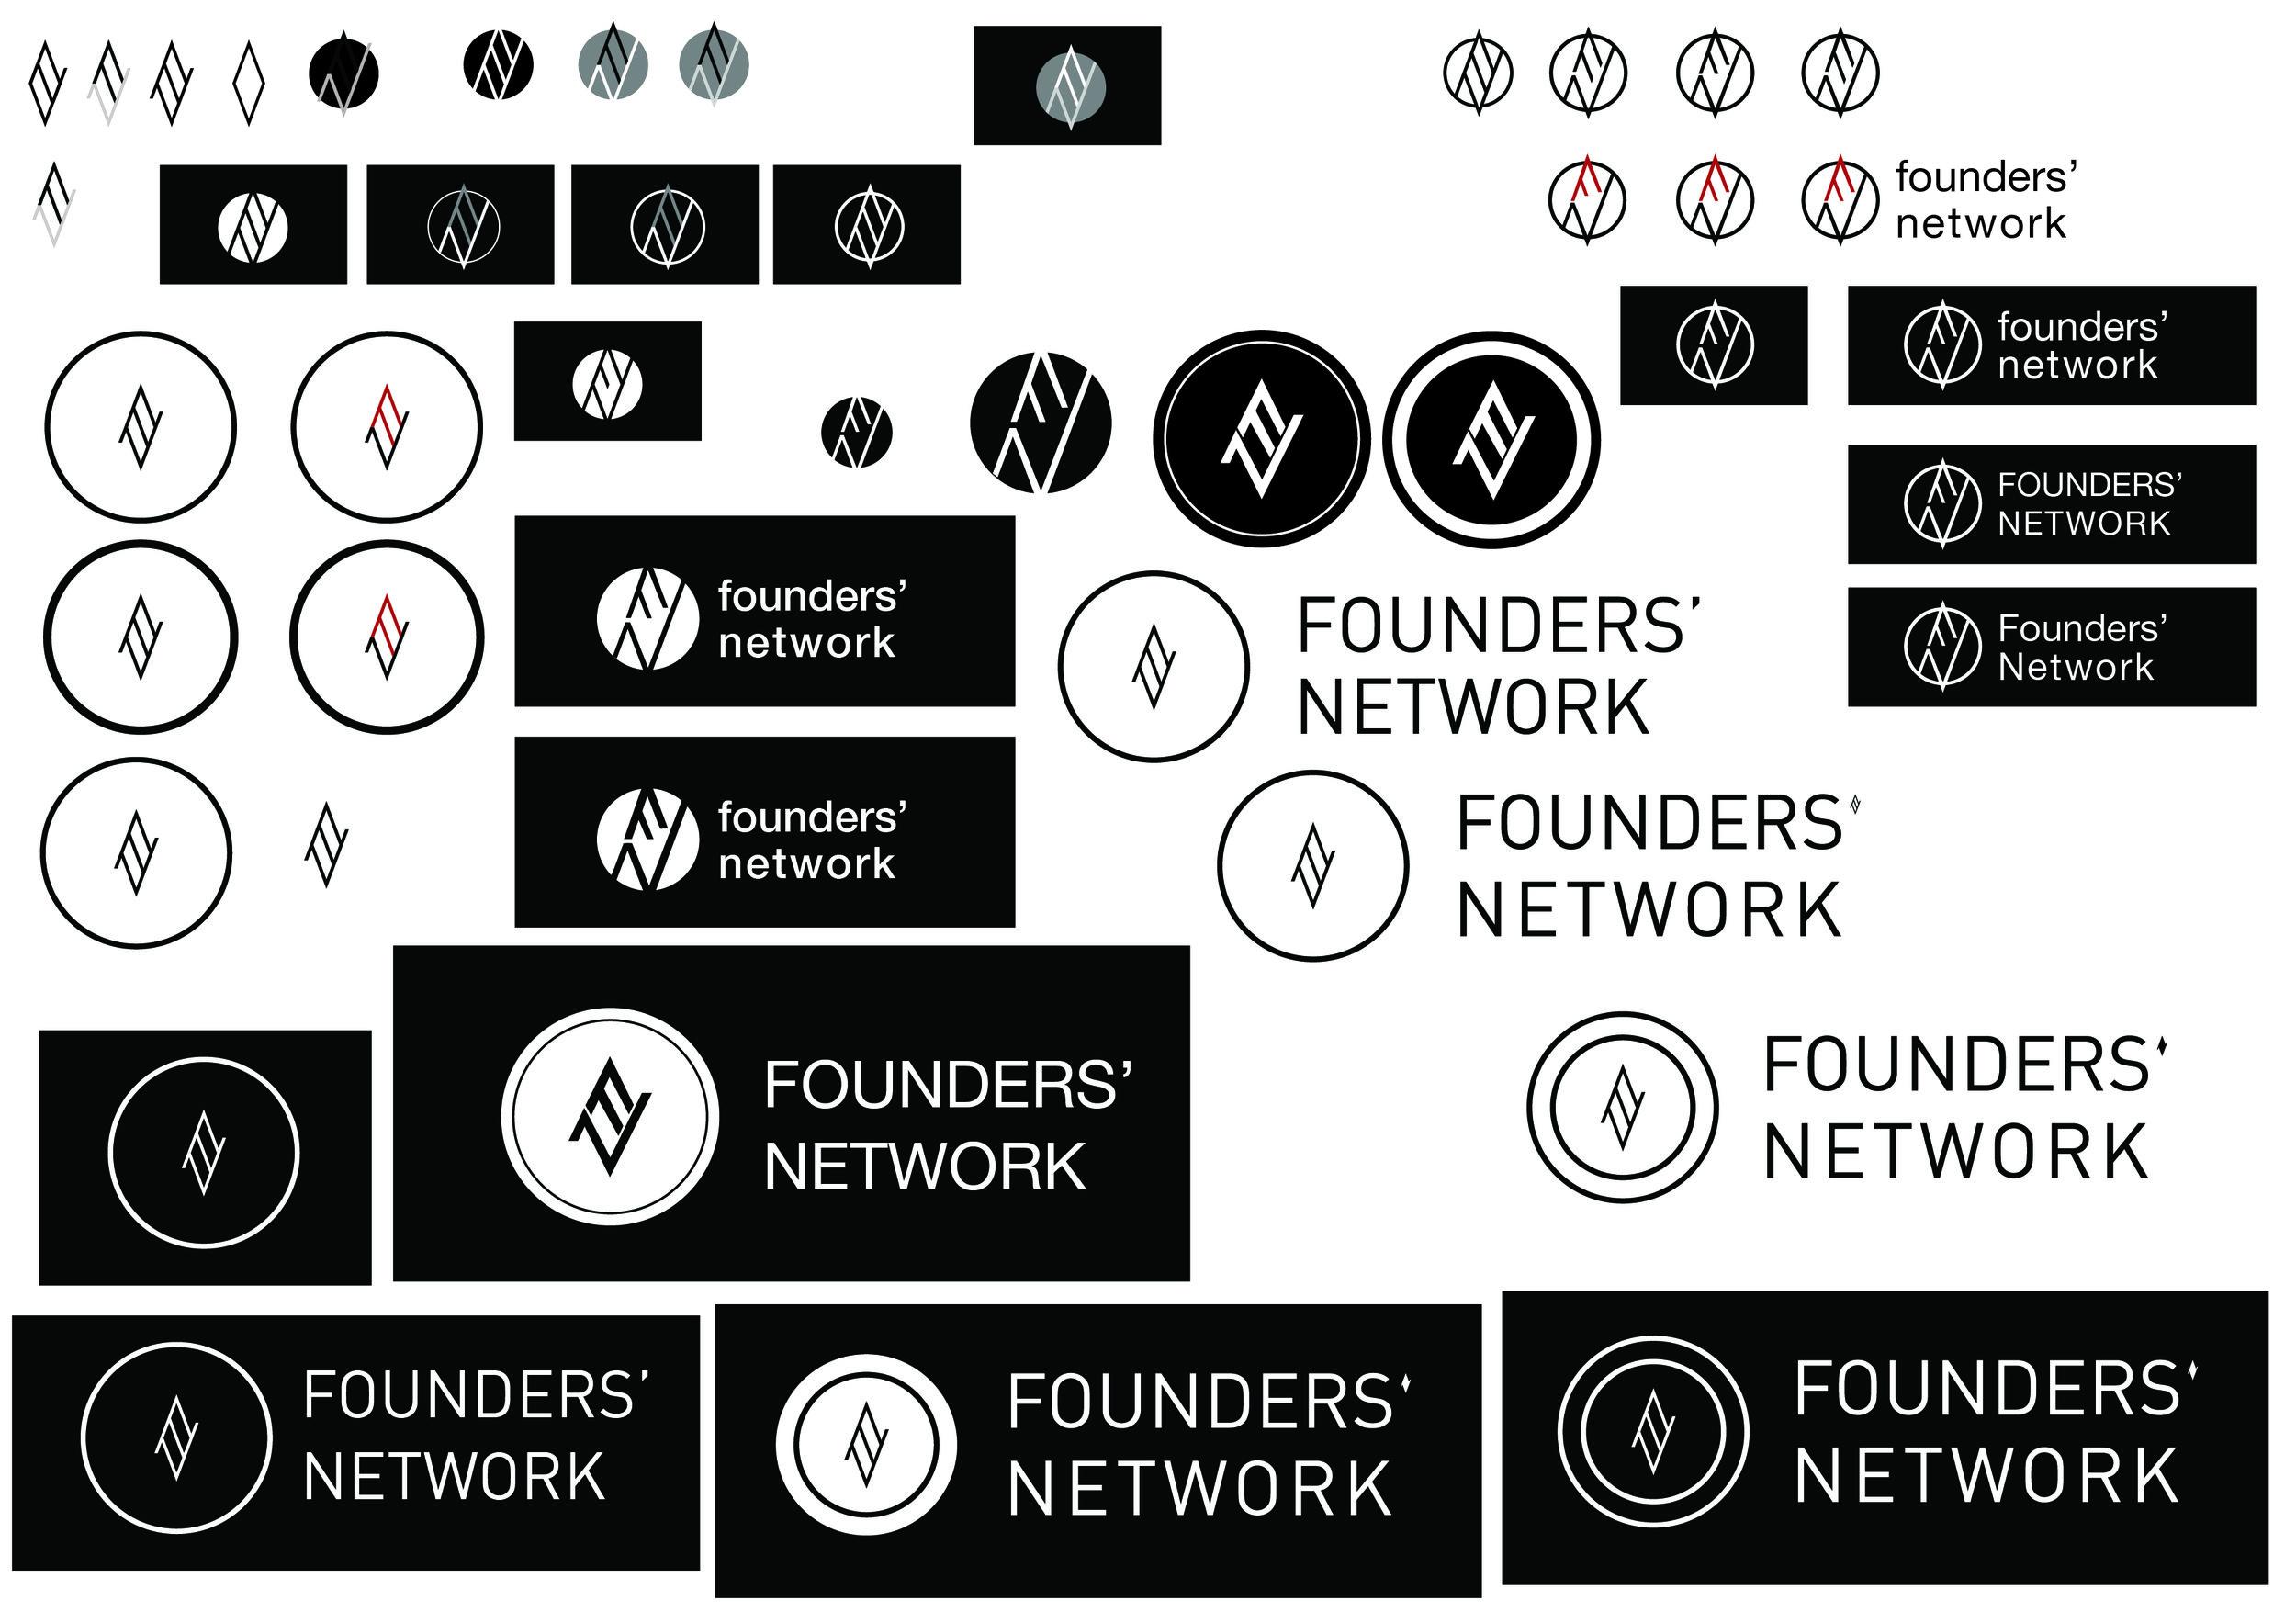 TechNorth-Founders-Network2-03.jpg